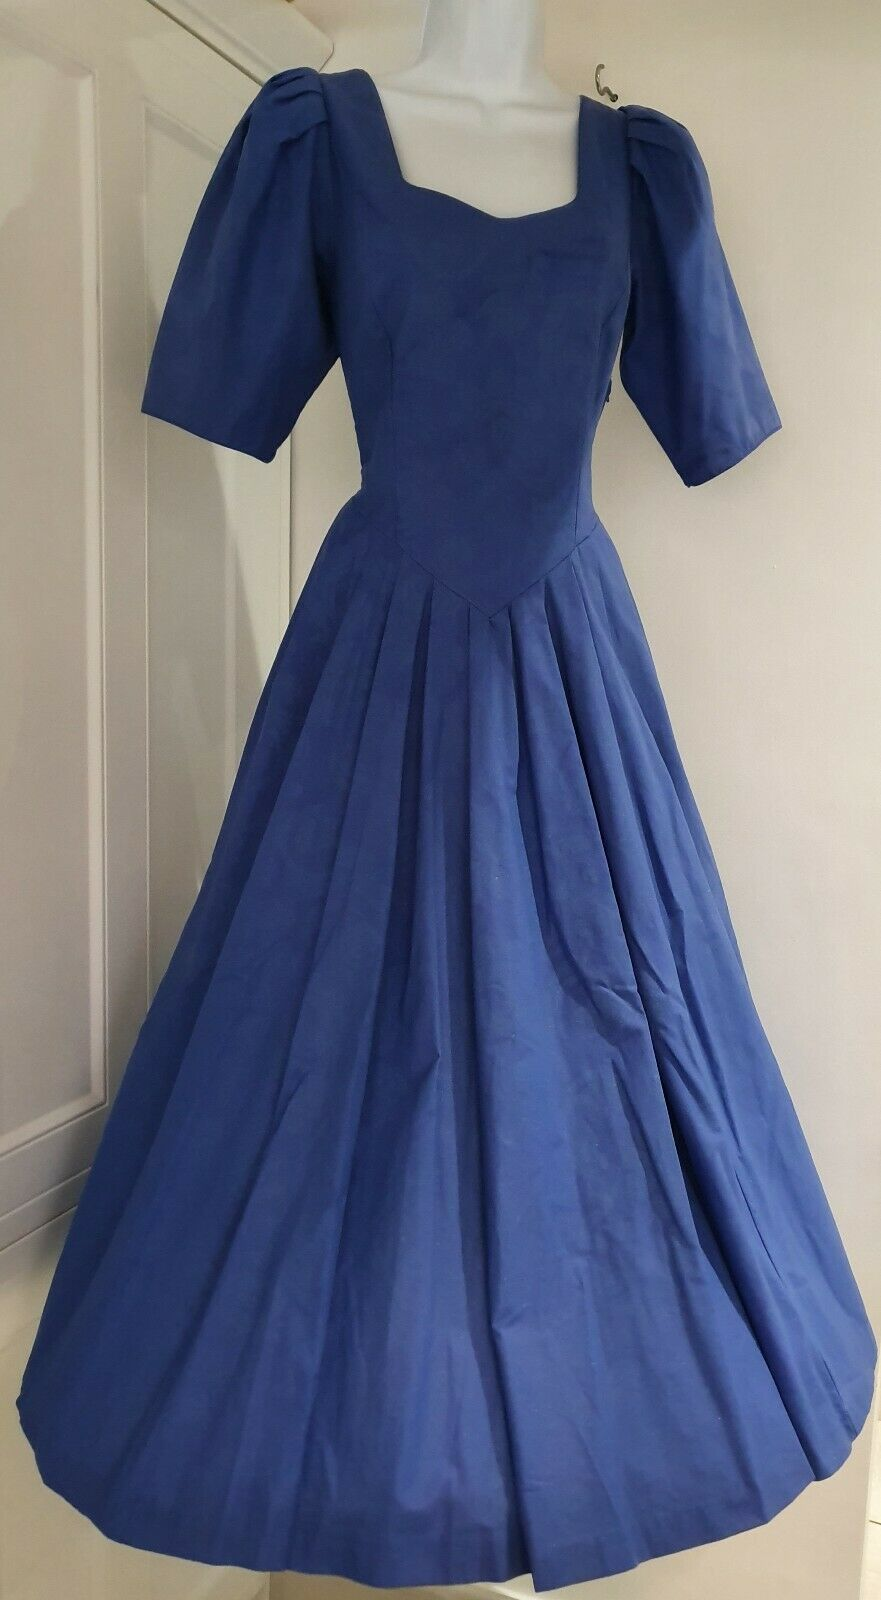 Womens Laura Ashley Vintage Blue Puff Sleeves Bustle Back Fairytale Dress 12 Vgc